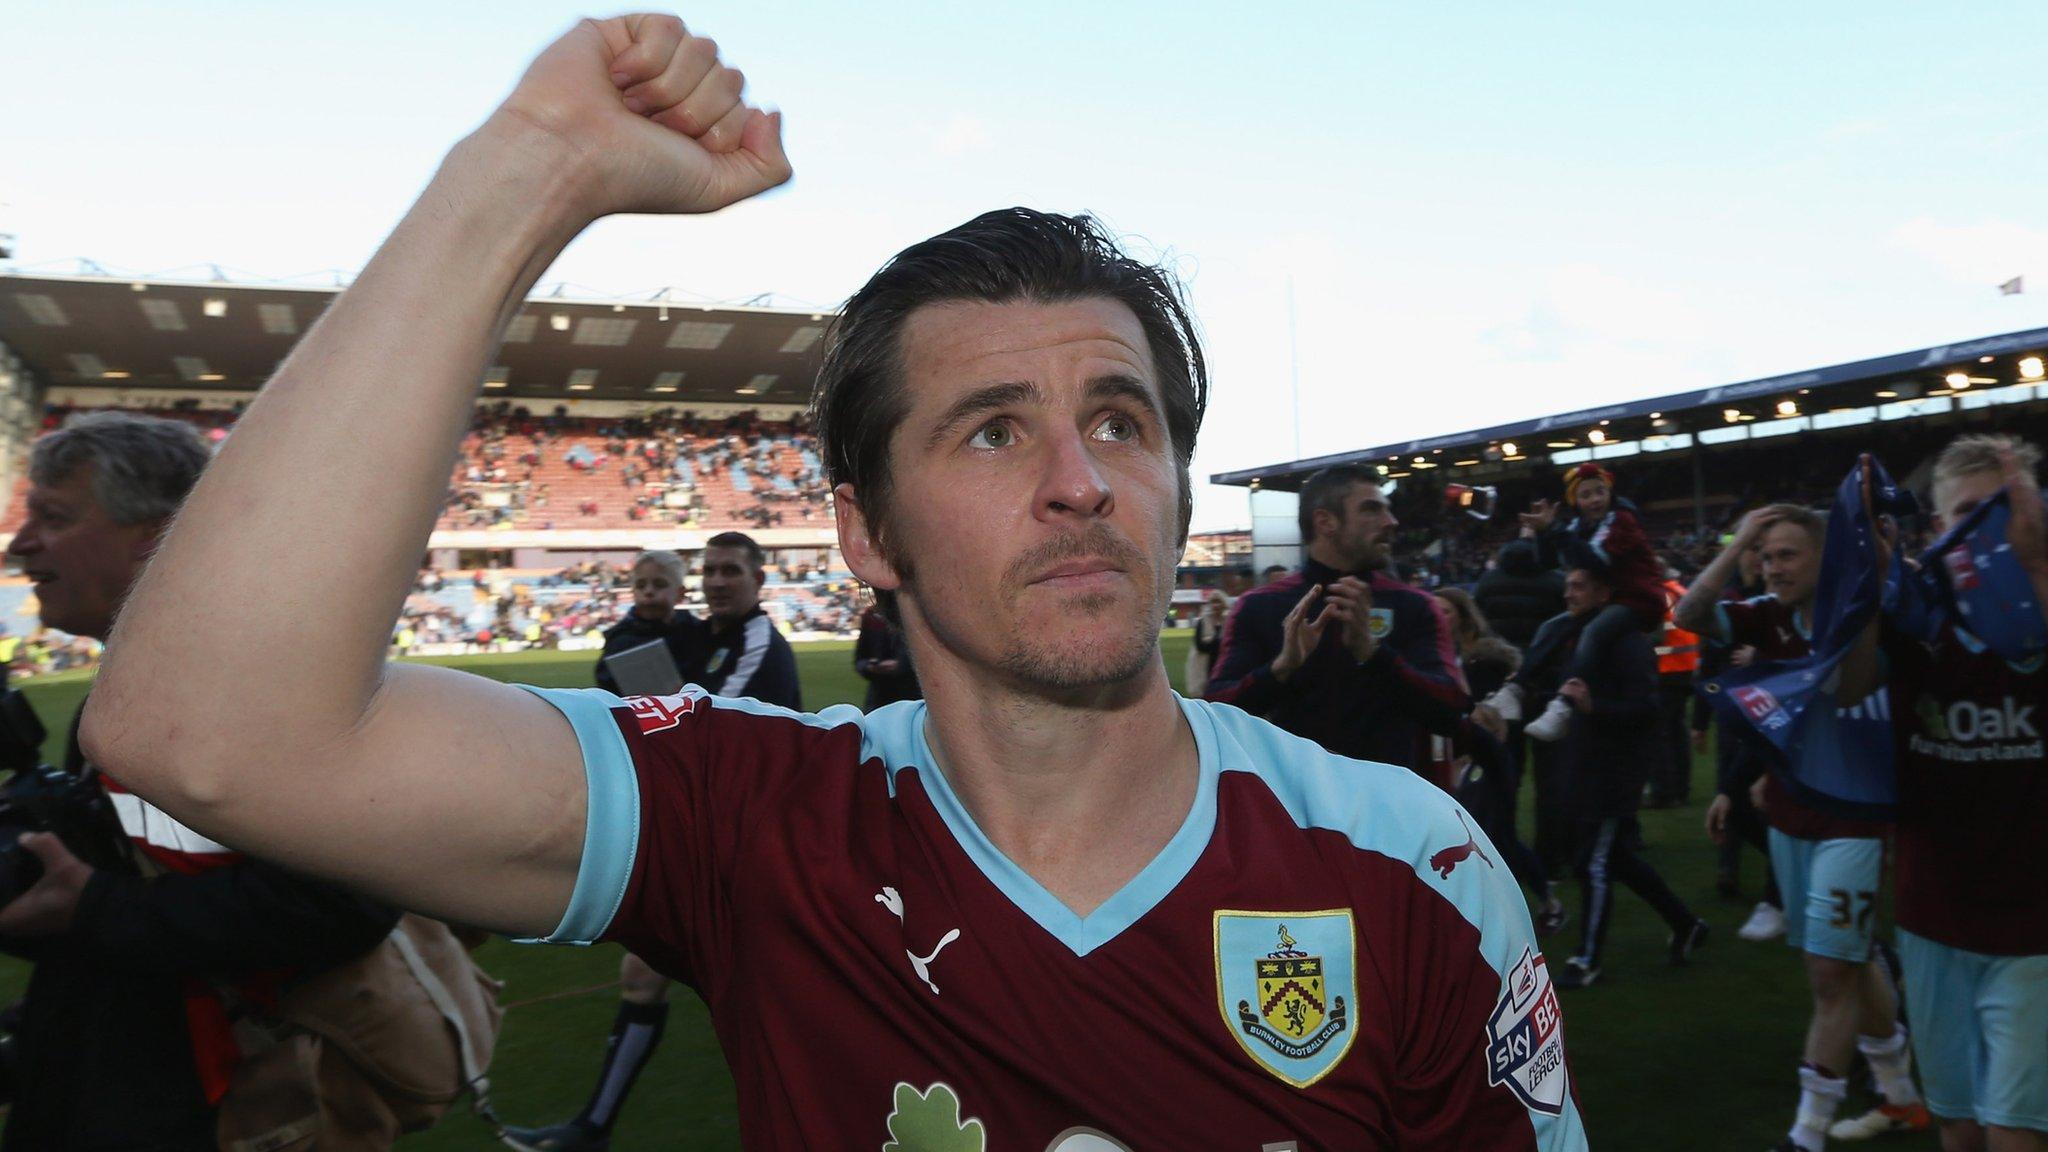 Joey Barton: Fleetwood Town announce ex-Burnley midfielder as head coach